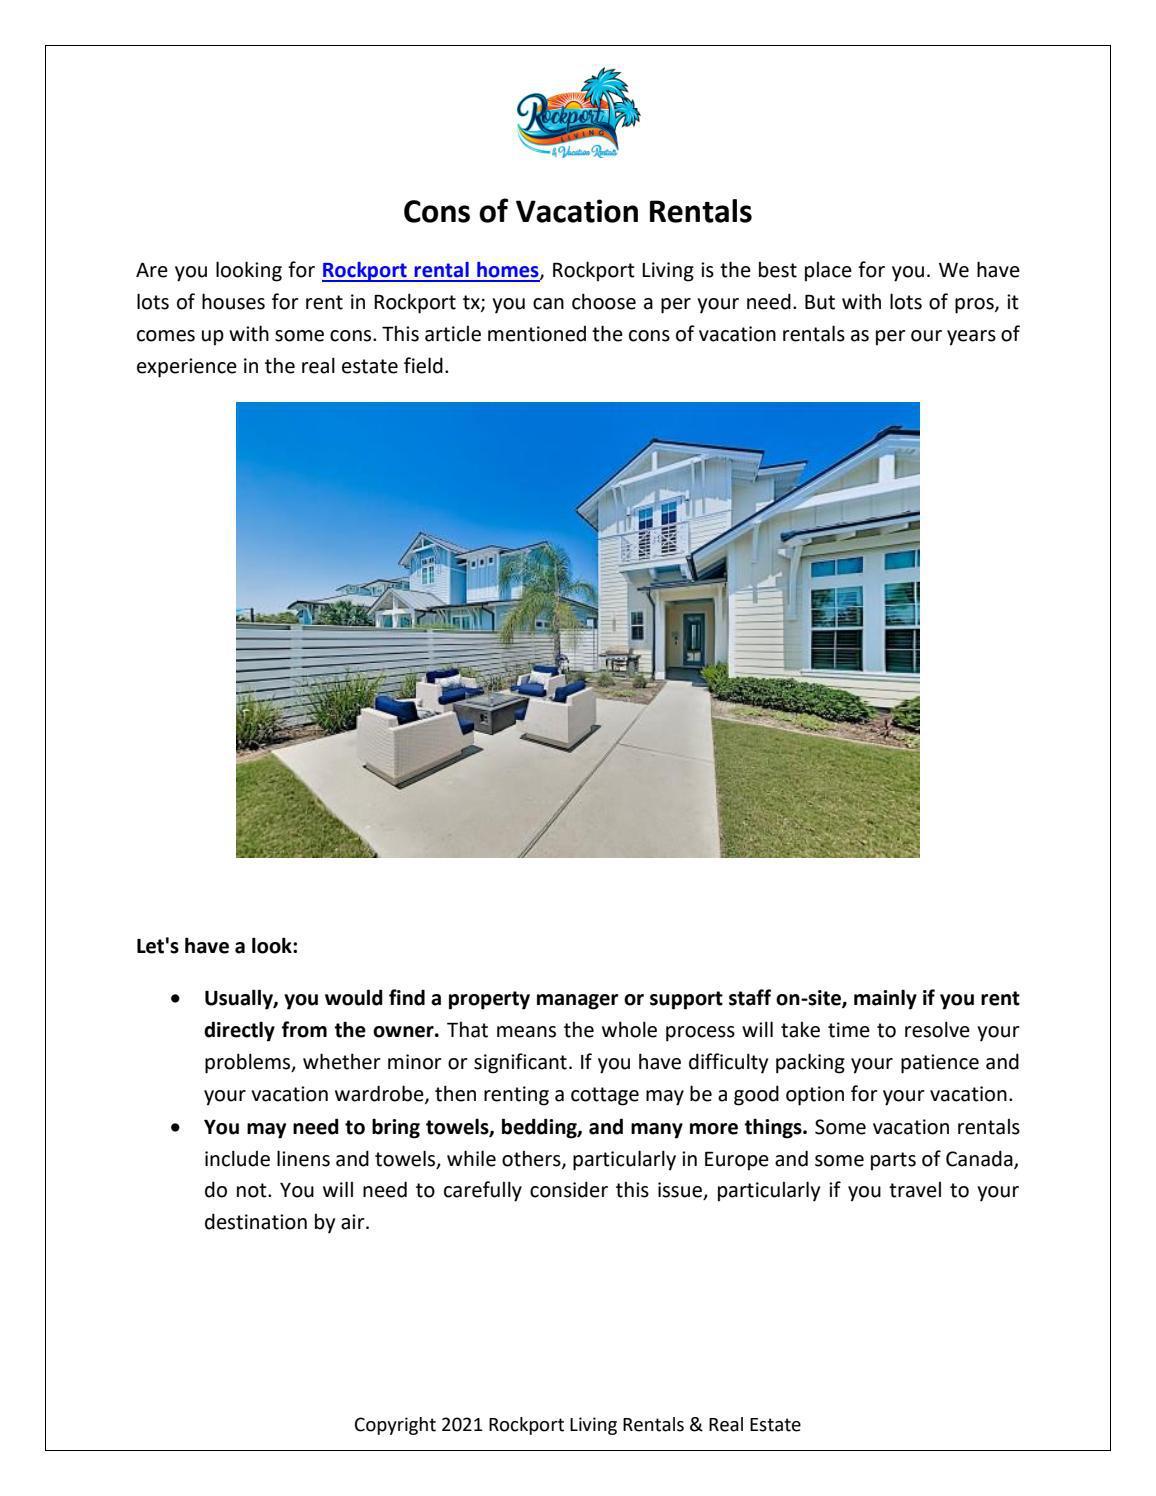 Cons of Vacation Rentals